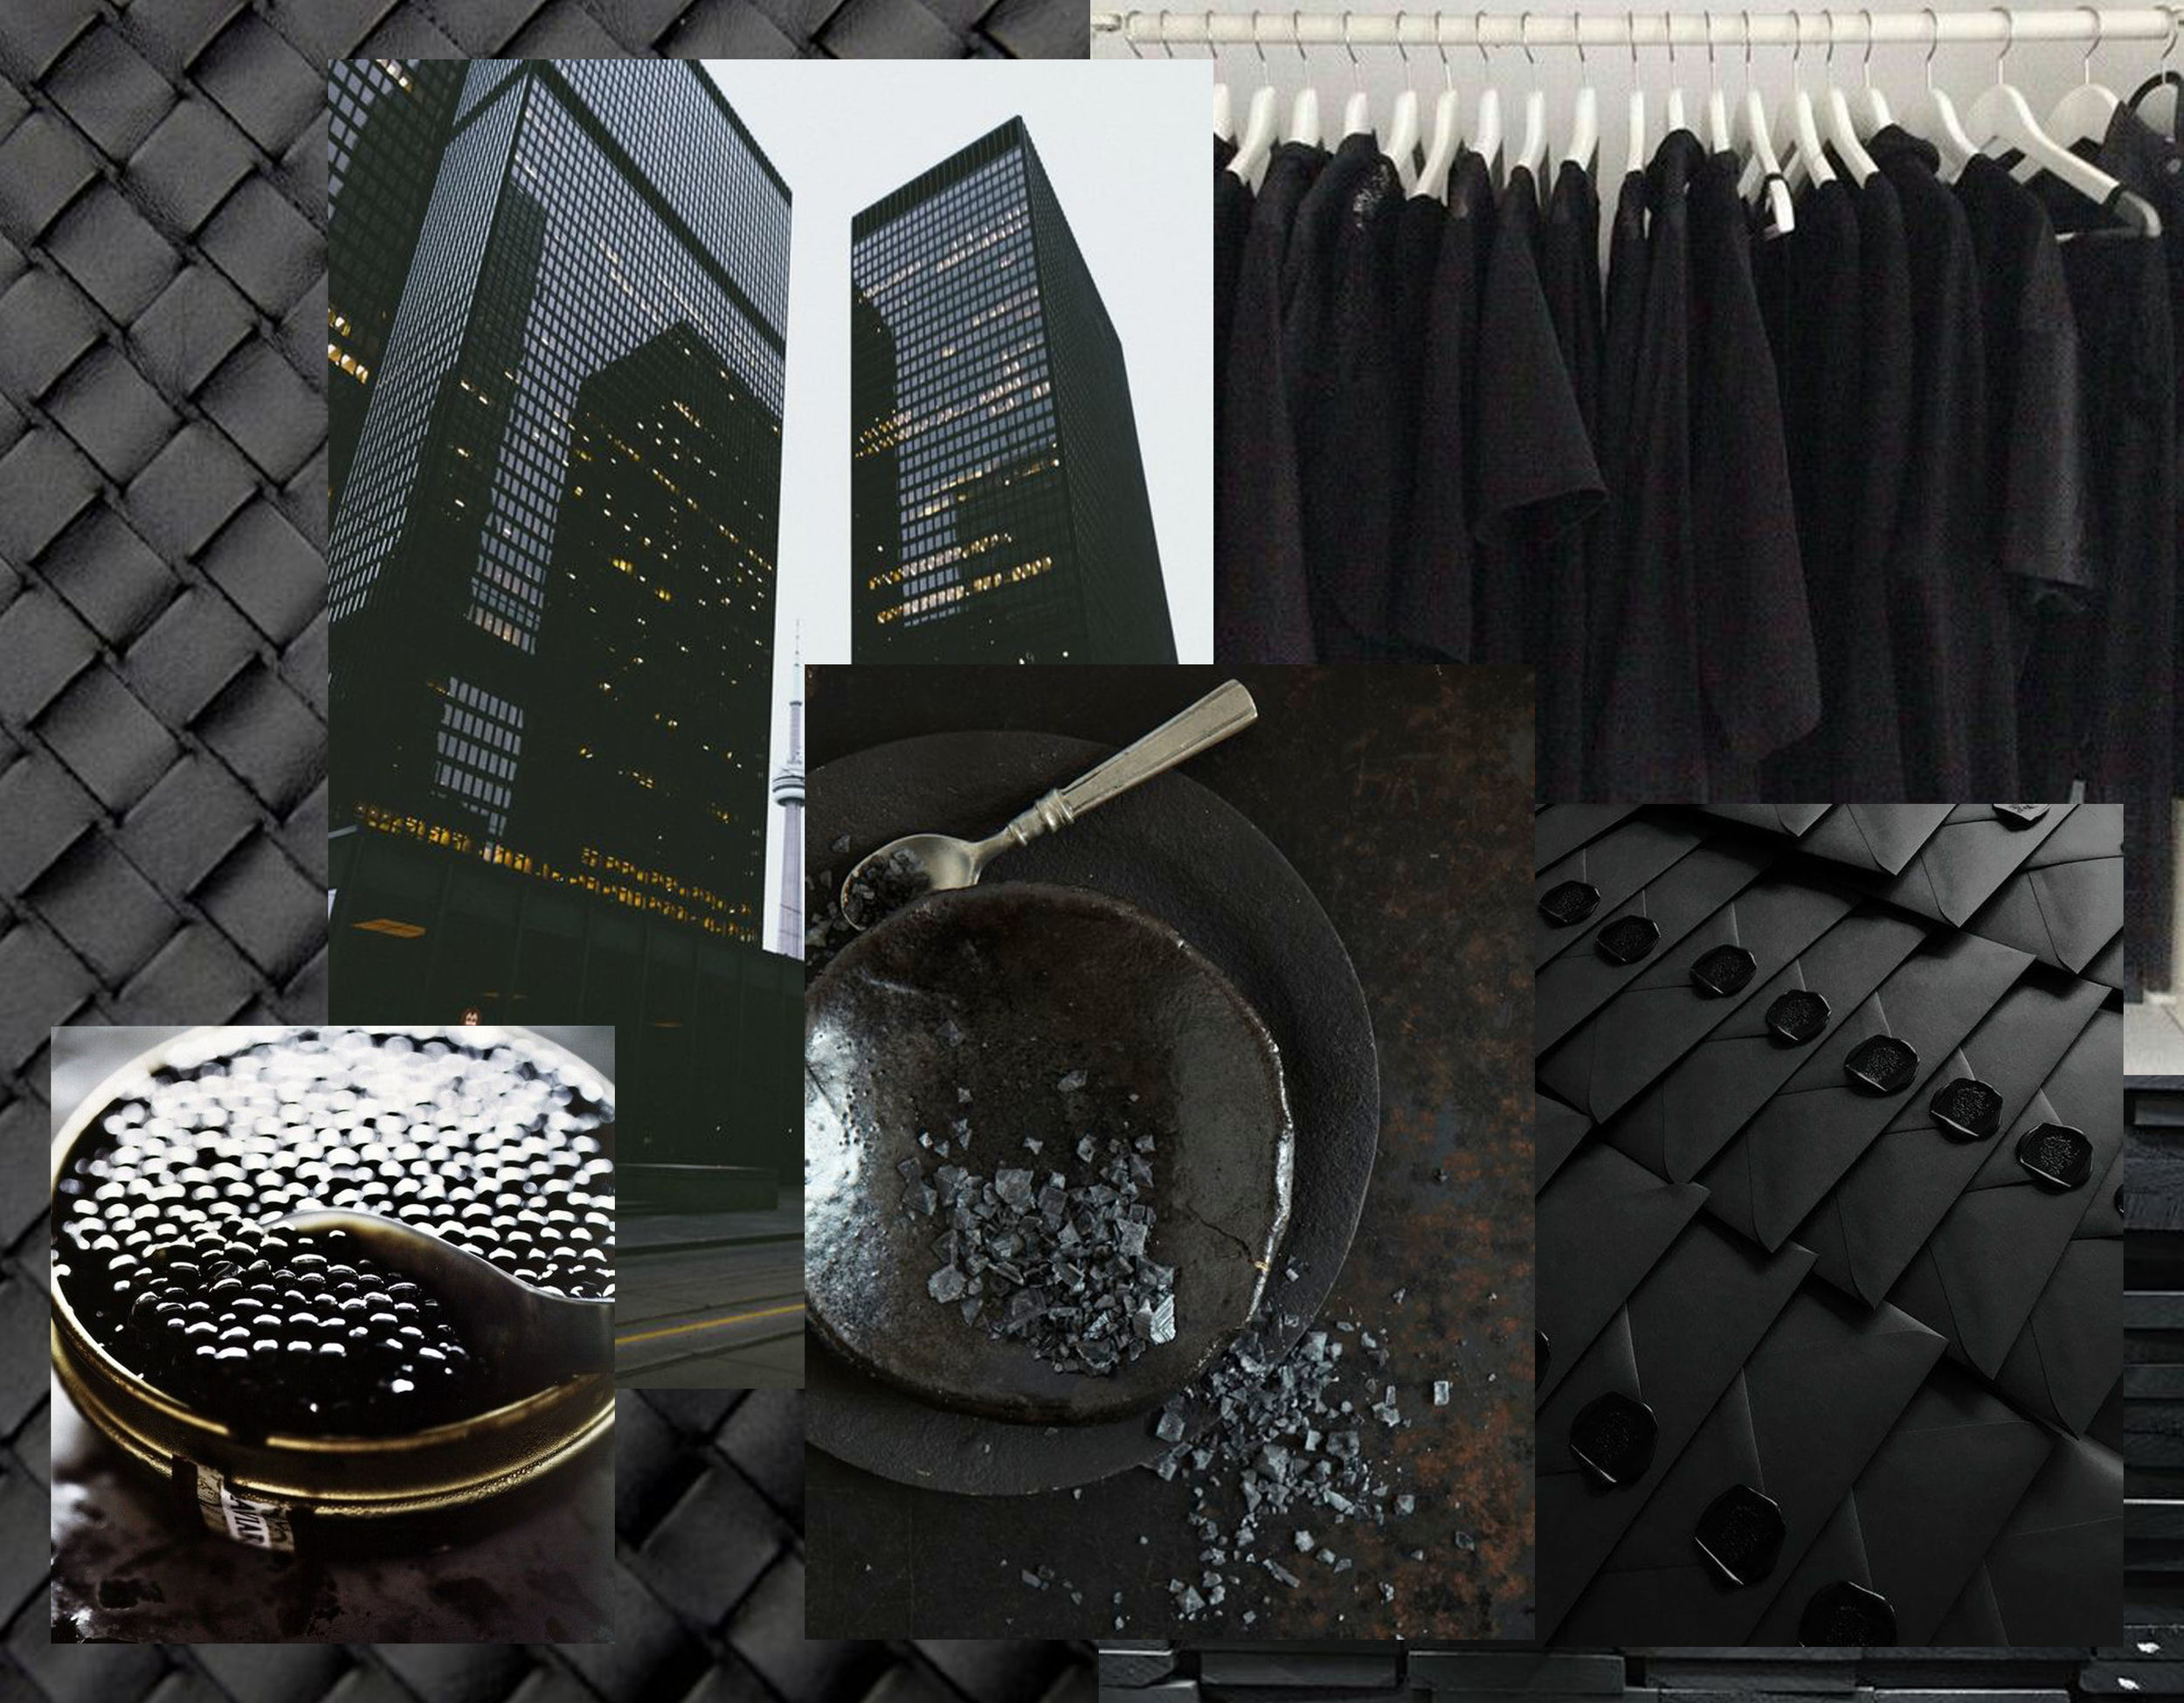 woven leather via  Pinterest  - caviar via  Pinterest  - city view via  Pinterest  - back garderobe  We Heart It  - plates  Sarah Hogan  - envelops via  Pinterest